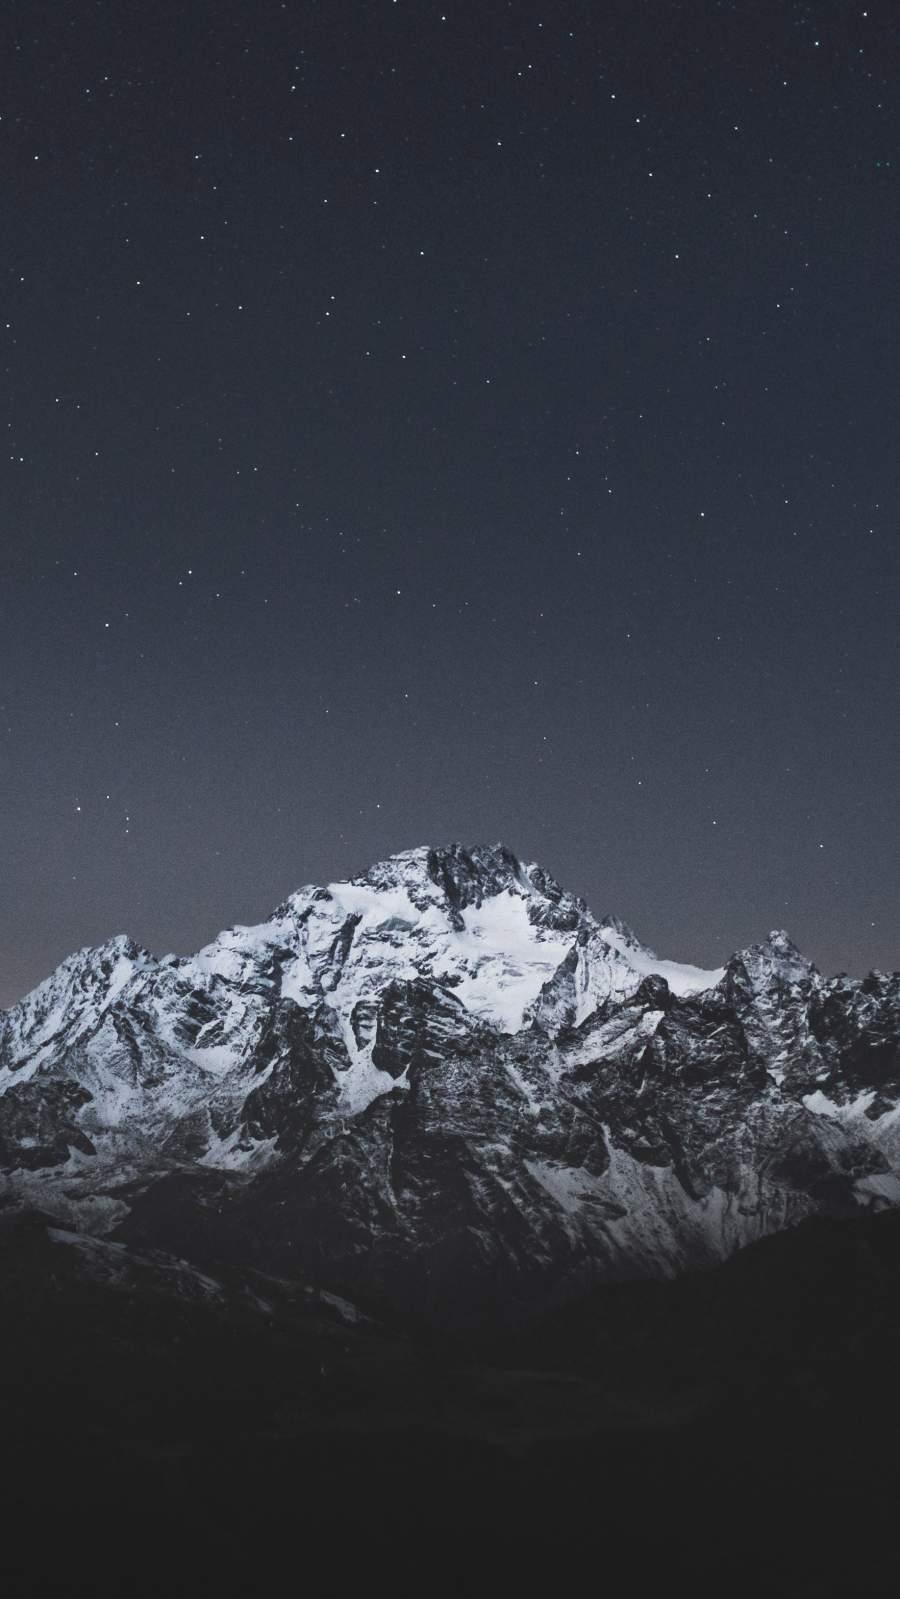 Night Snow Mountain iPhone Wallpaper